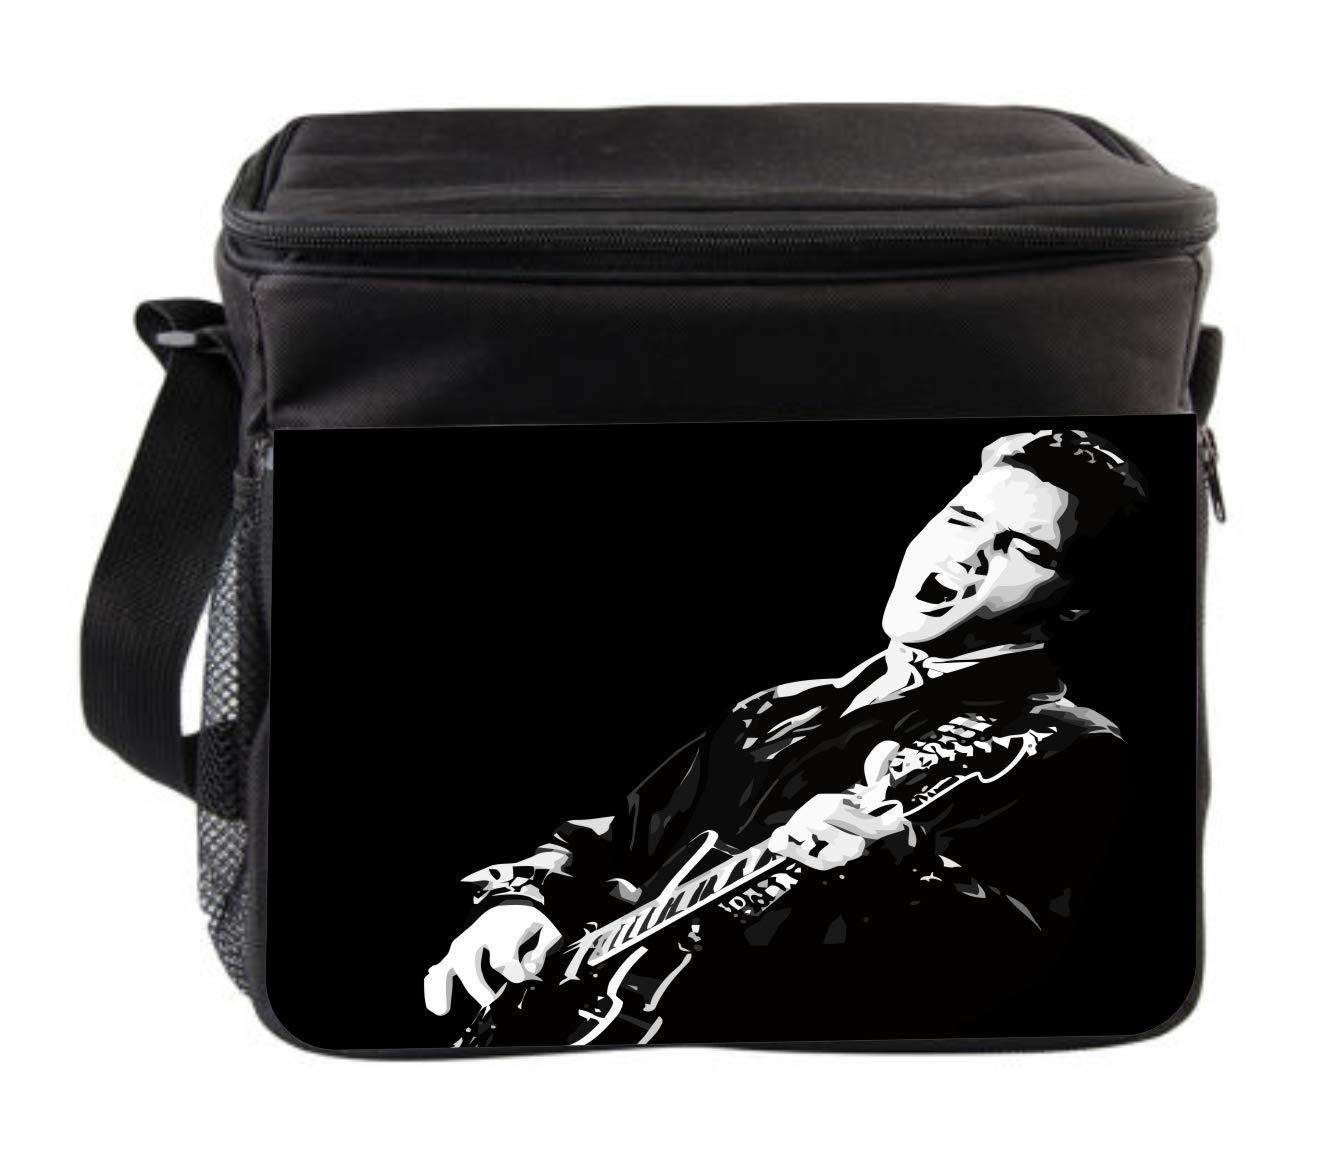 Rosie Parker Inc. Vintage Presley Guitar Cross Body Thermal Cooler Bag for Travel by Rosie Parker Inc.